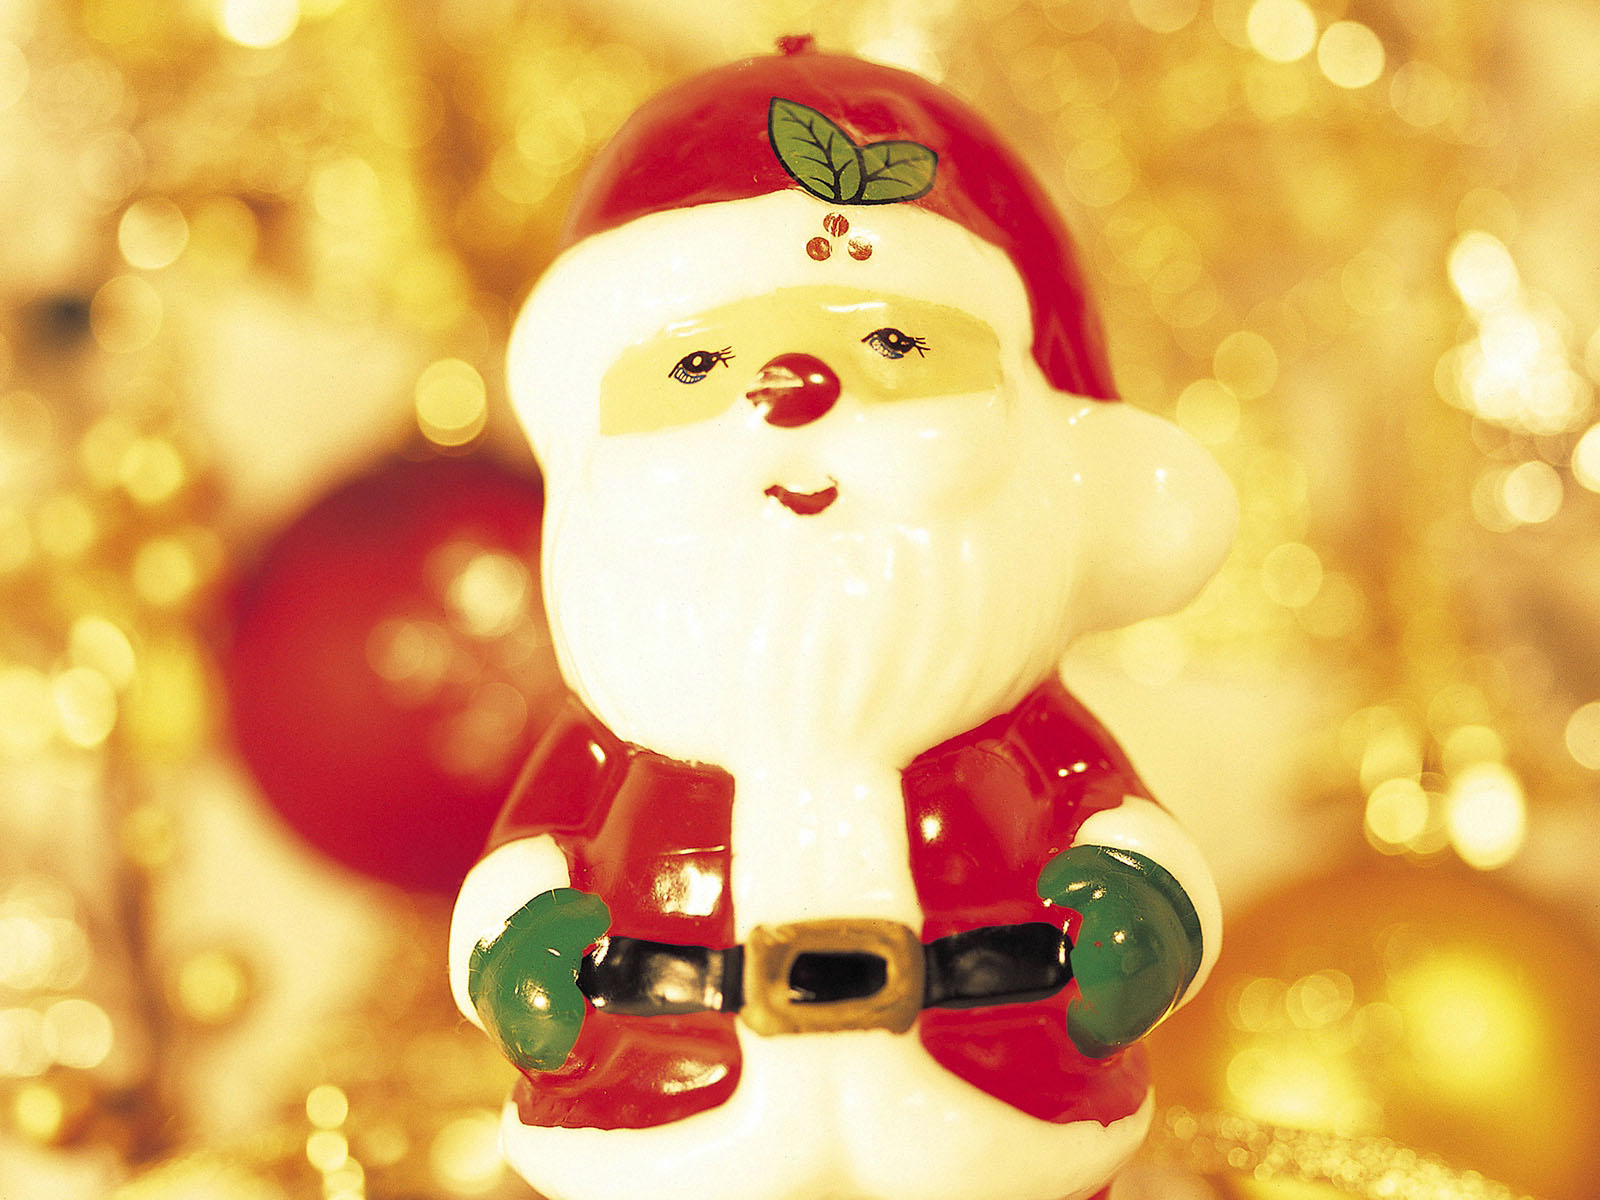 http://1.bp.blogspot.com/-FpZKsbHj8B8/Tq_THPSI33I/AAAAAAAAP3Y/8INRy0mg0V0/s1600/Mooie-kerstman-achtergronden-leuke-kerstman-wallpapers-afbeelding-plaatje-foto-23.jpg